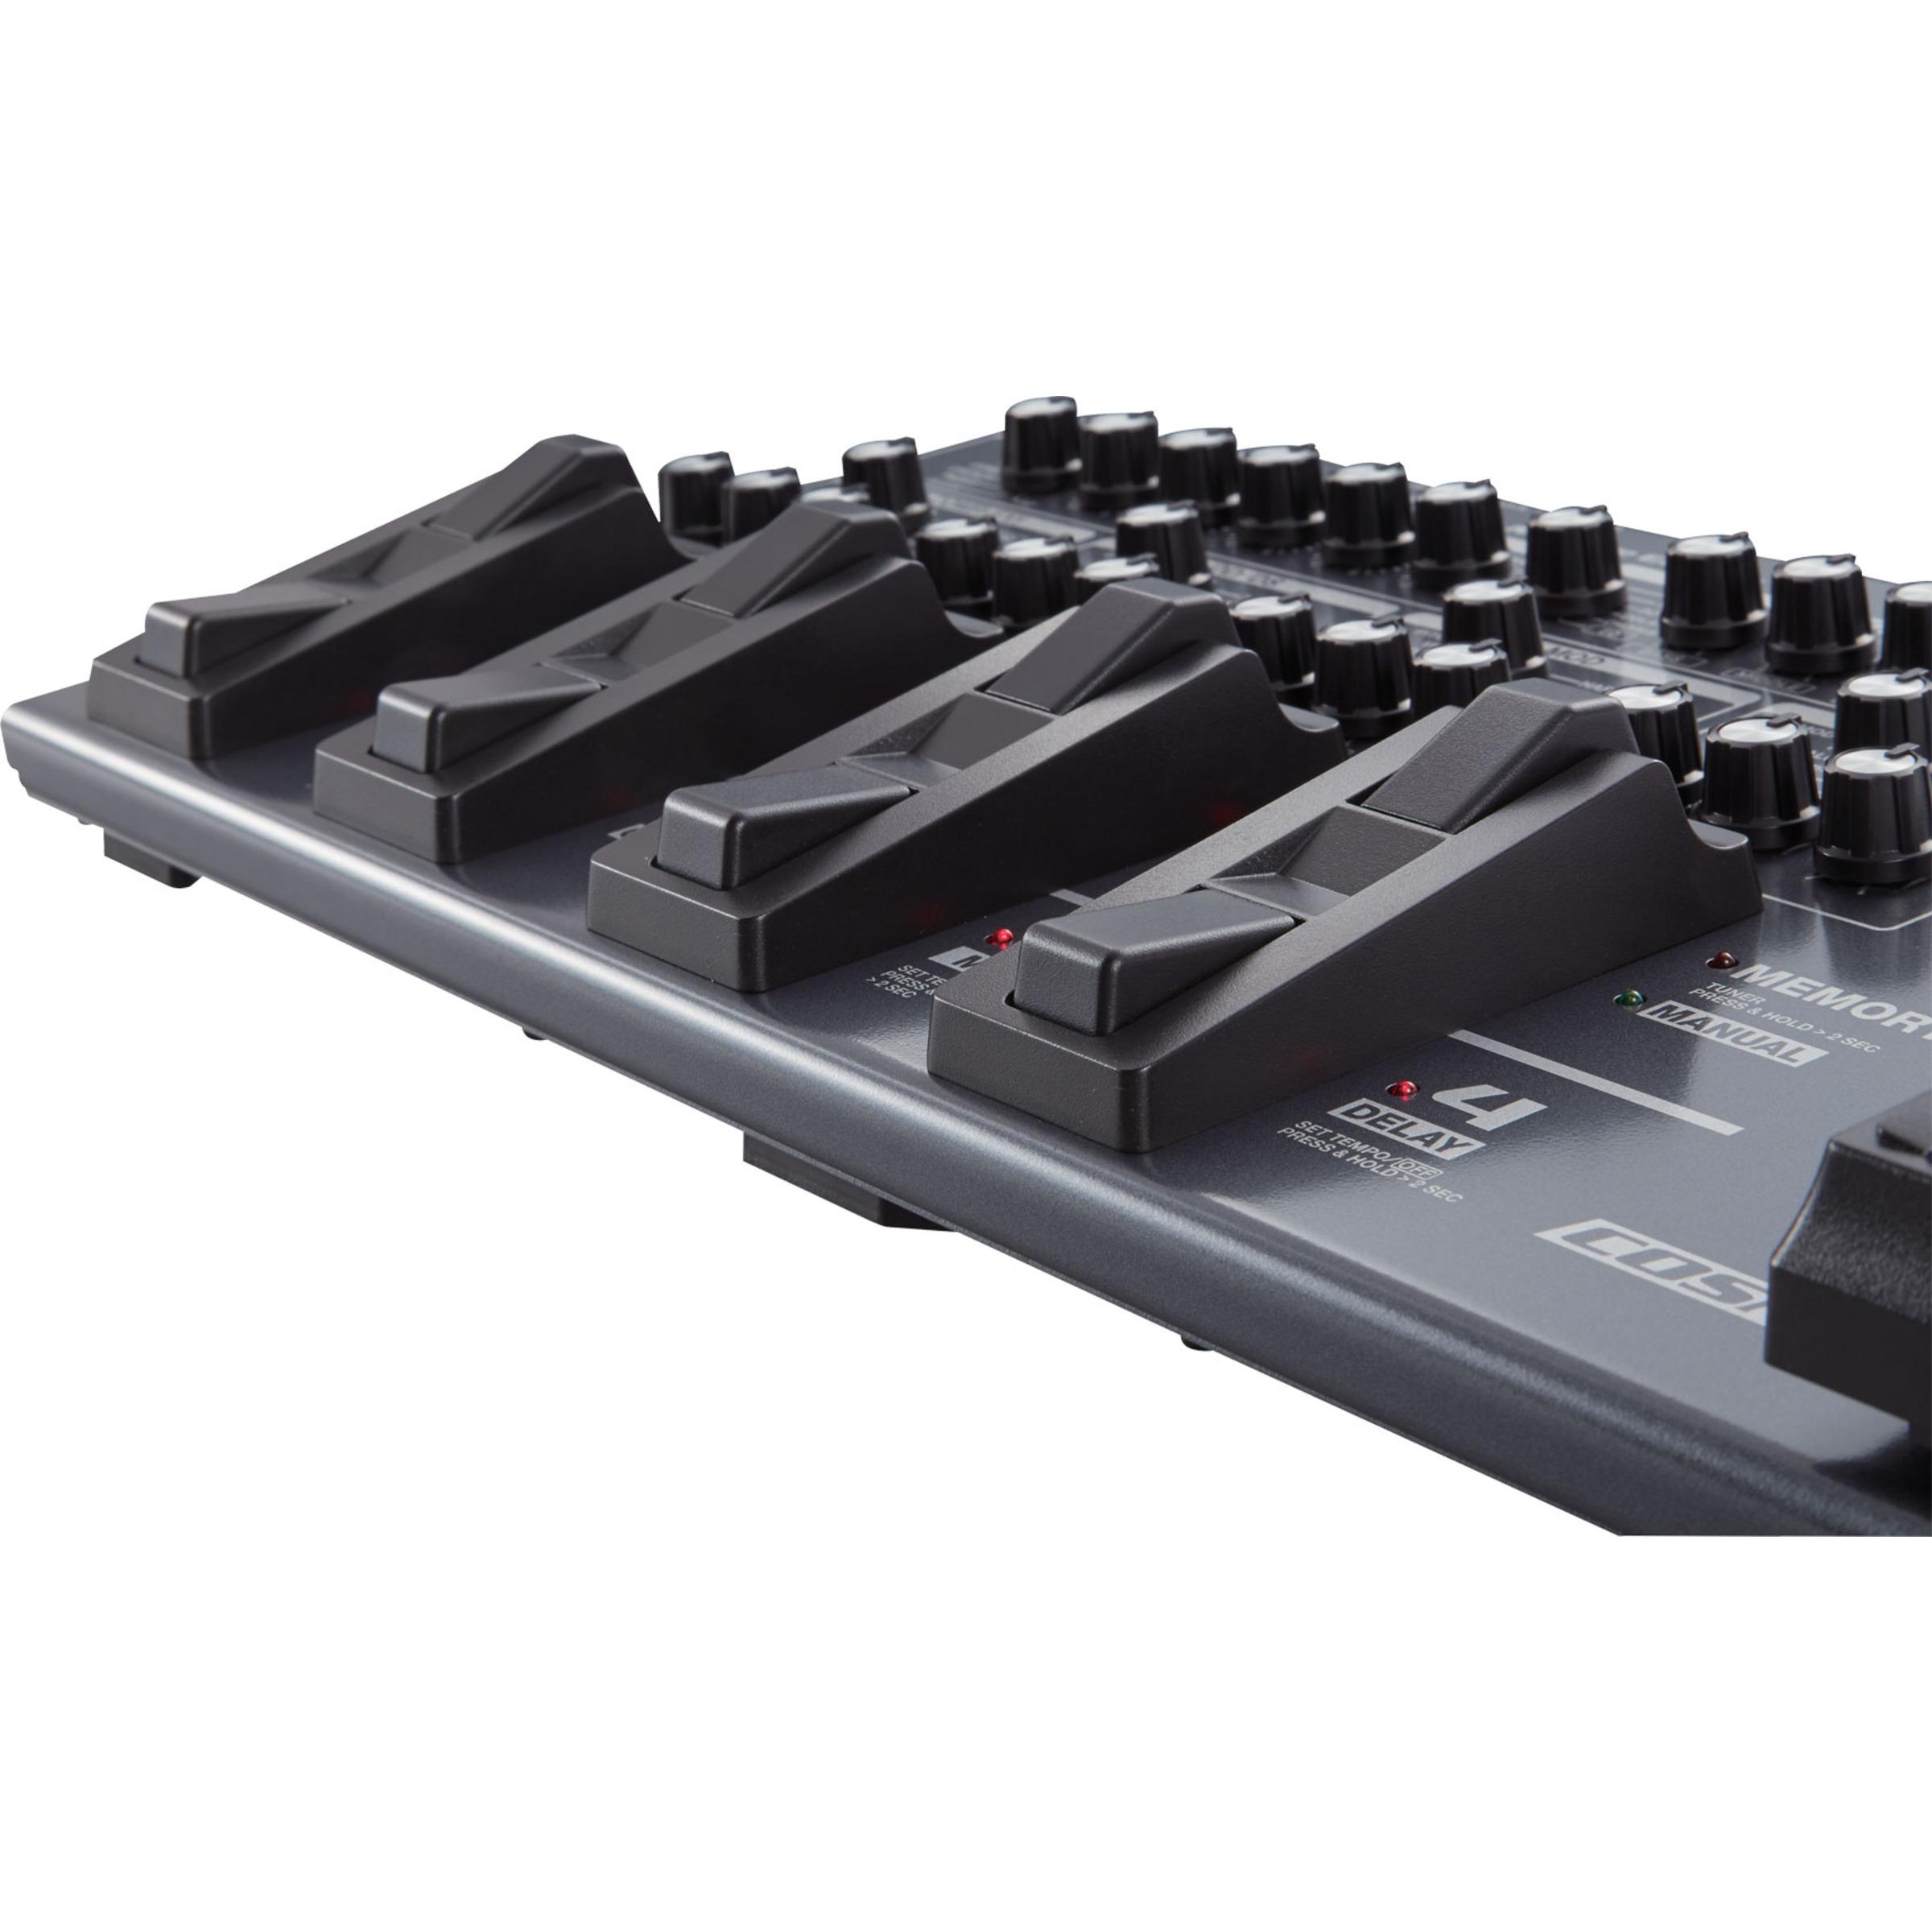 boss me 80 guitar multi effects pedal giggear. Black Bedroom Furniture Sets. Home Design Ideas